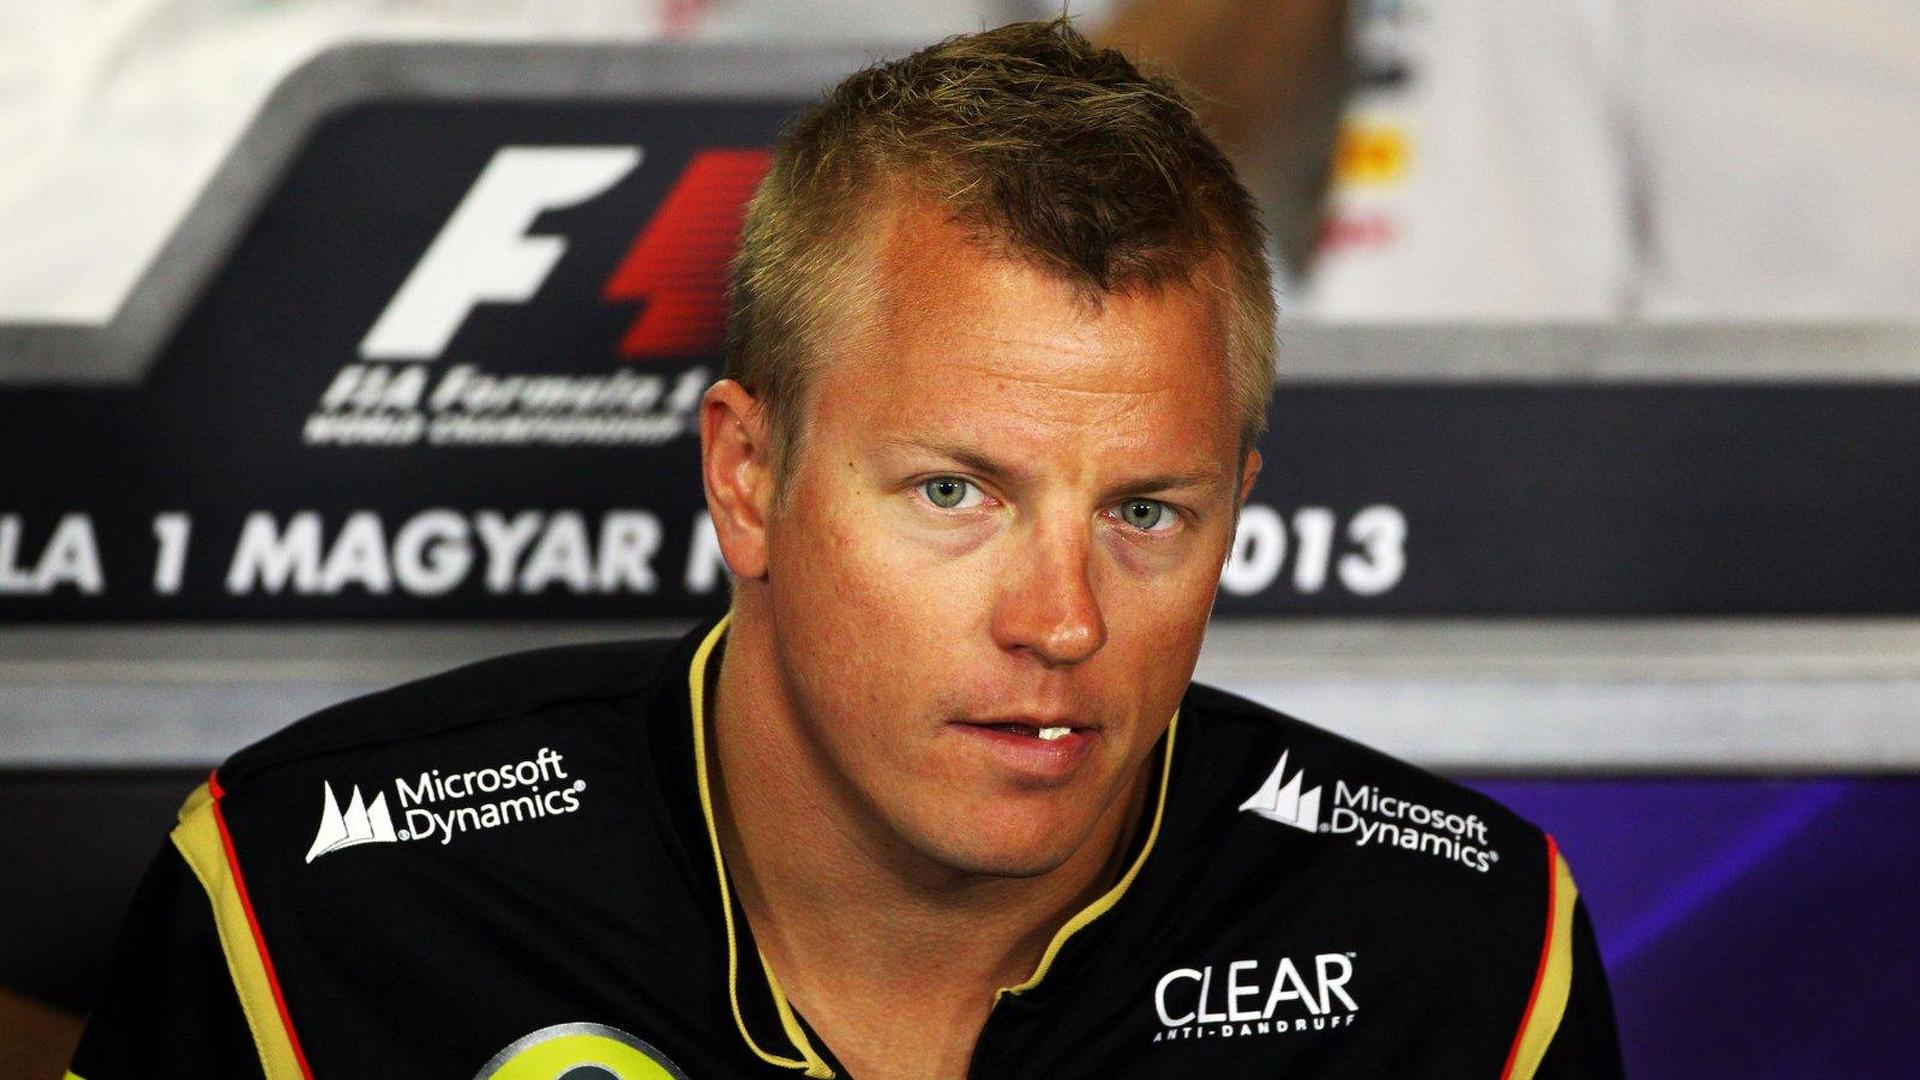 Ferrari offers Raikkonen seat for 2014 - report